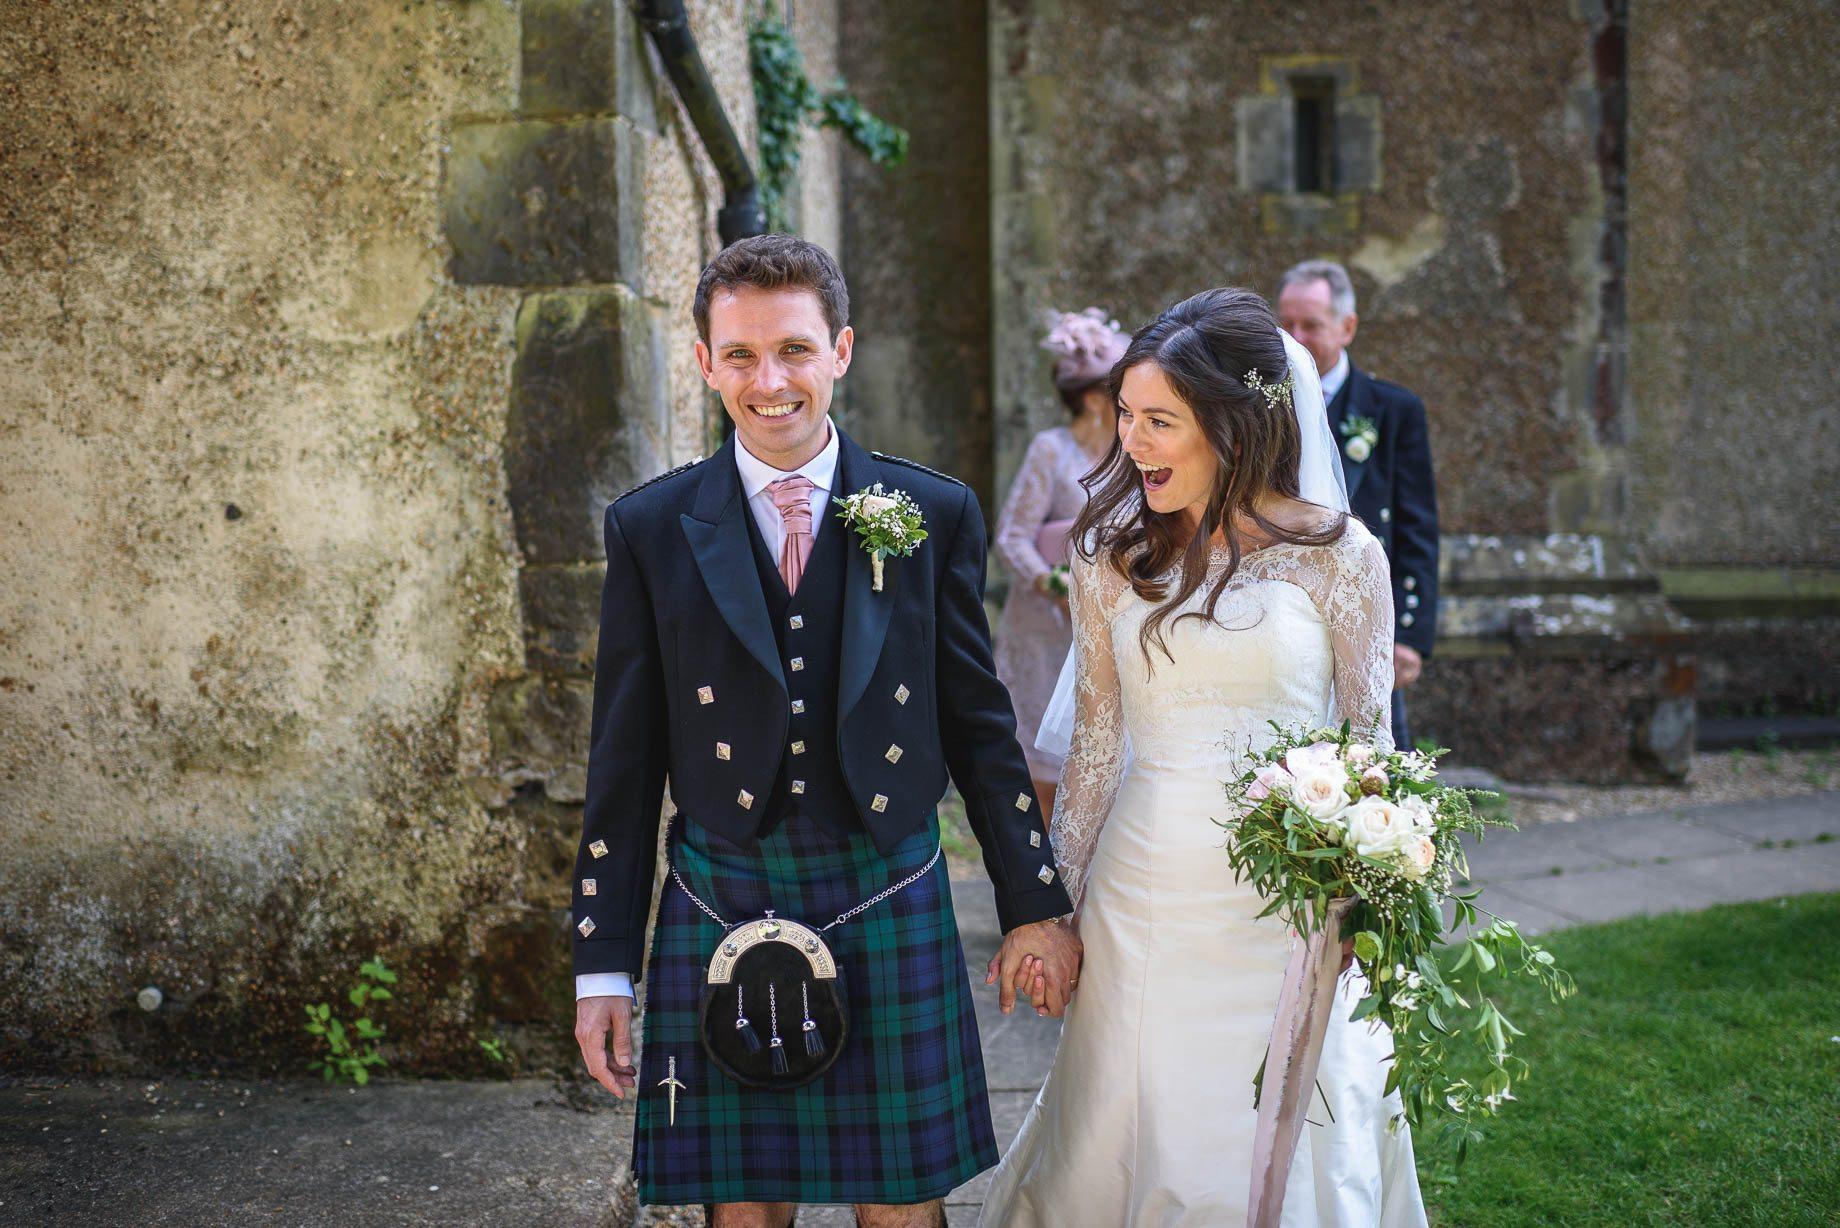 Gildings Barn wedding photography - Sarah and Steve (63 of 190)